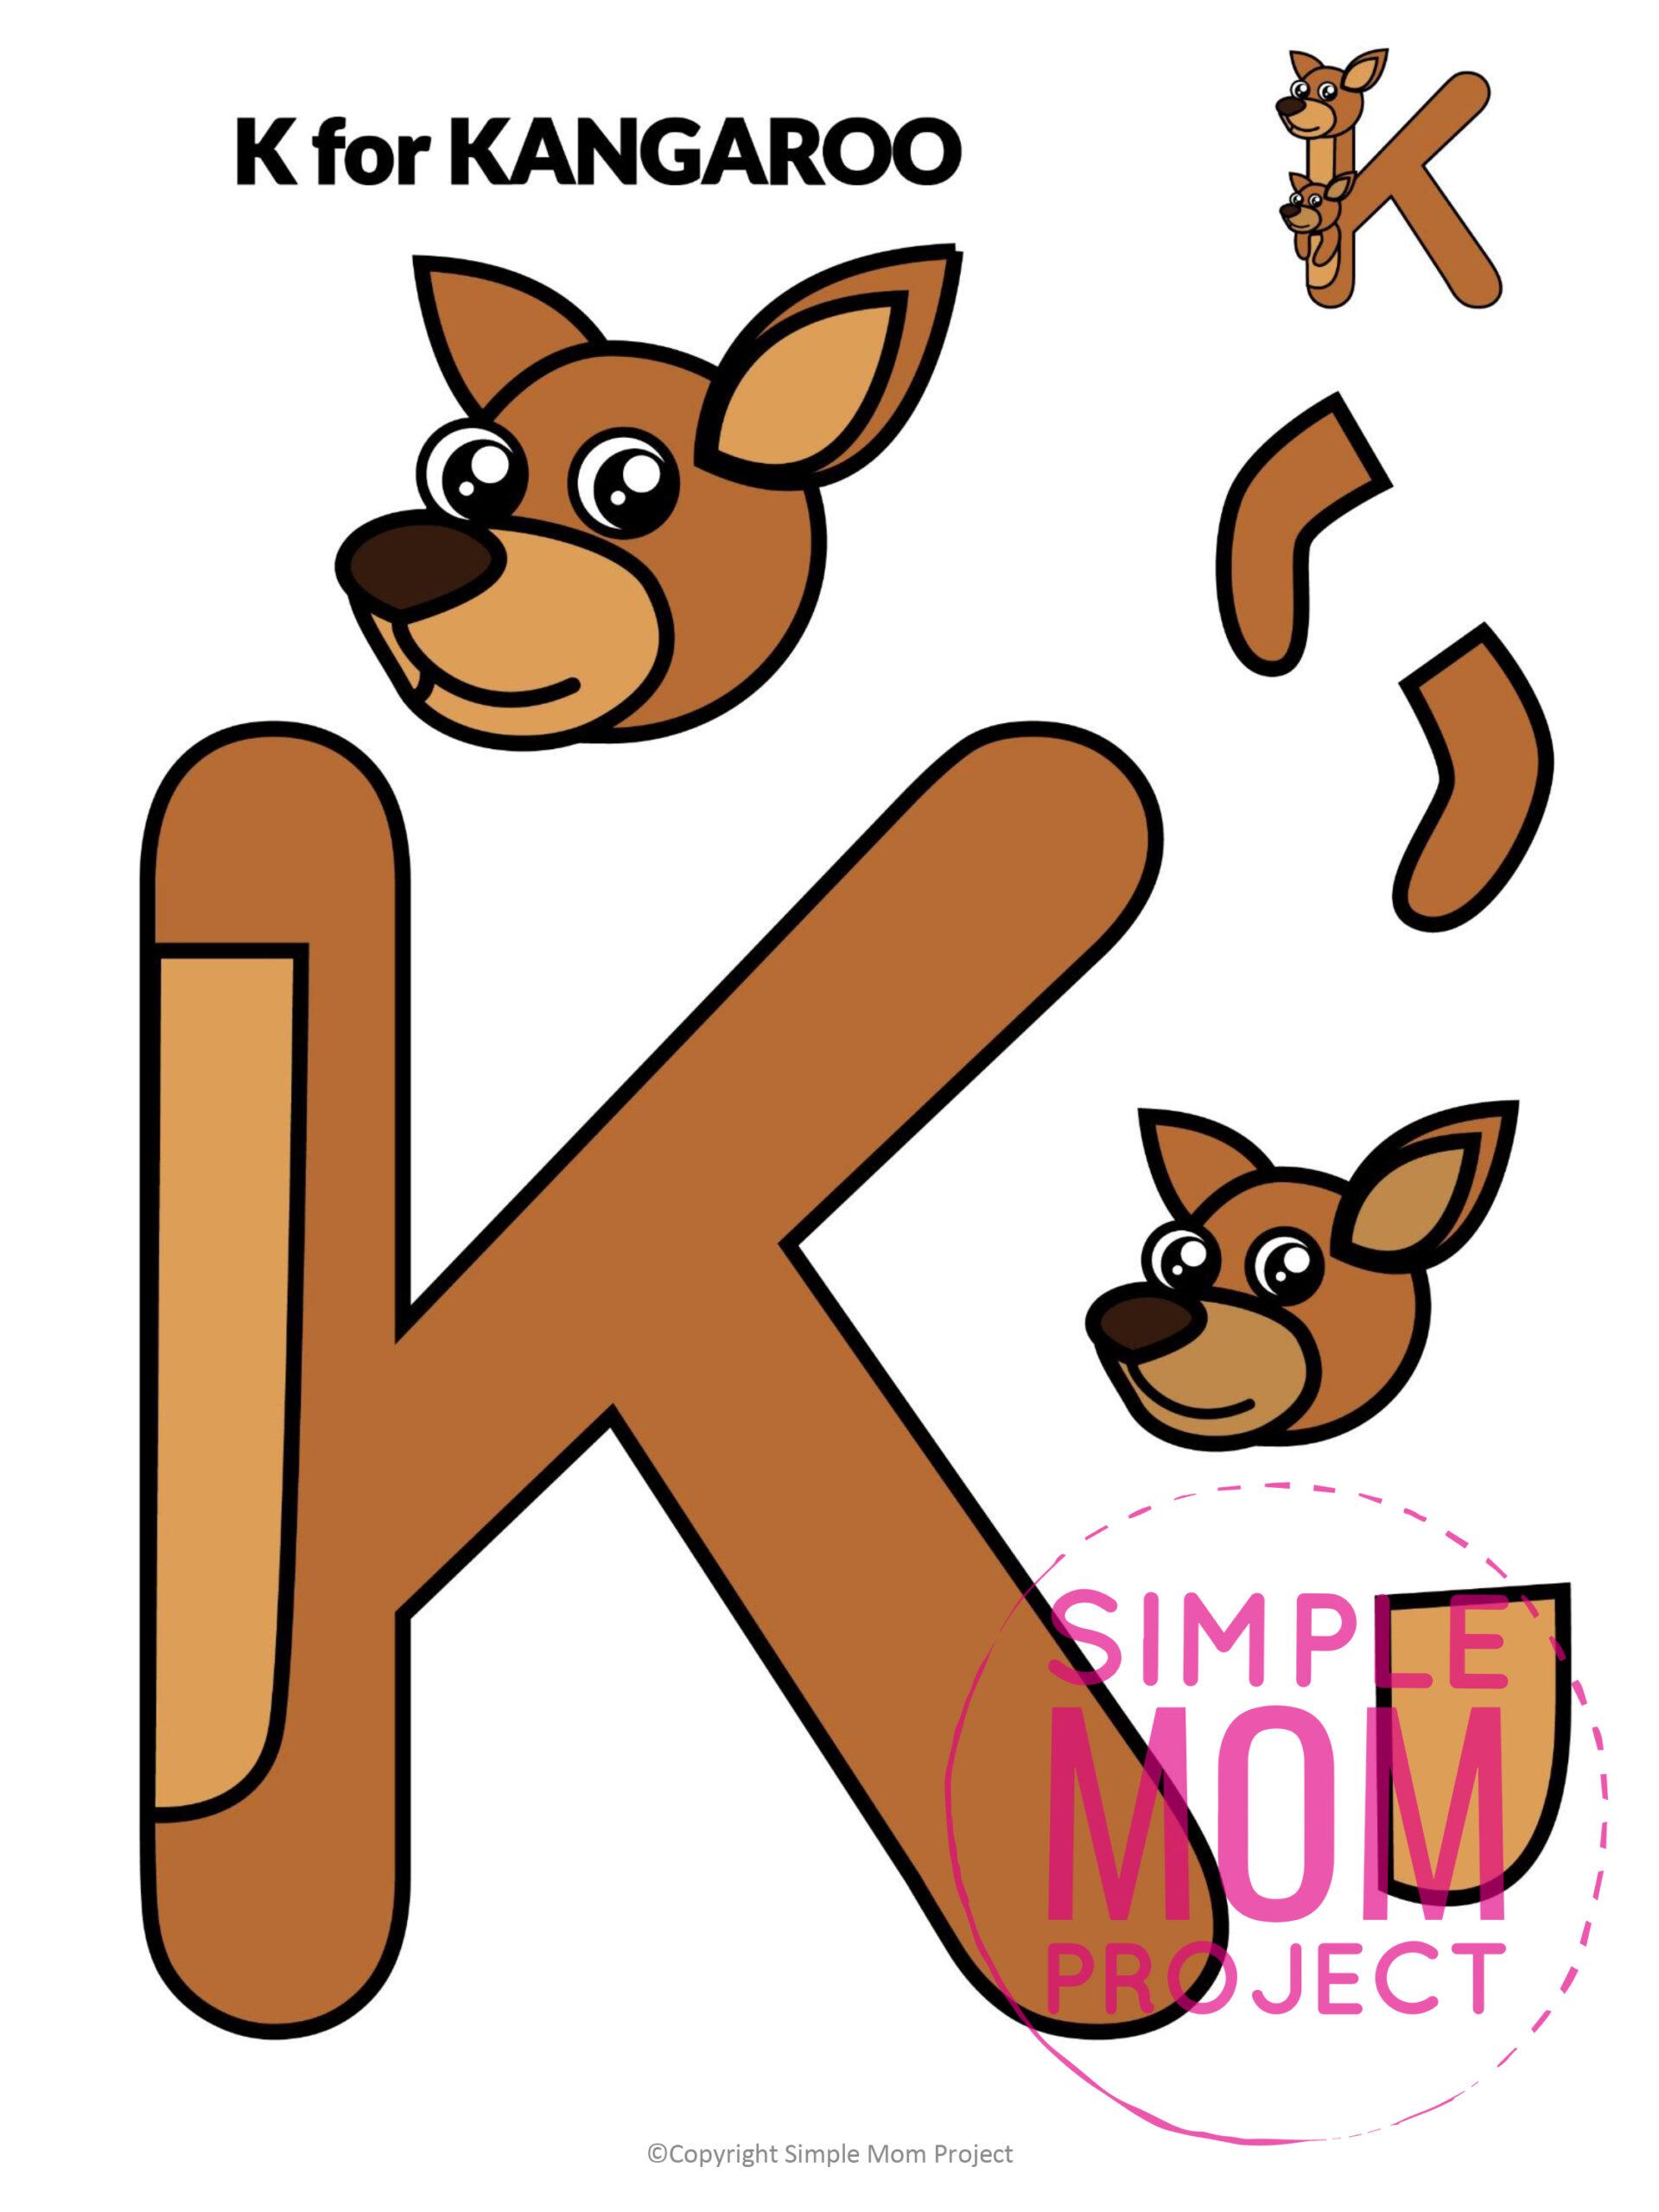 K is for Kangaroo Printable Craft Letter K Craft for Kids, preschoolers, toddlers and kindergartners